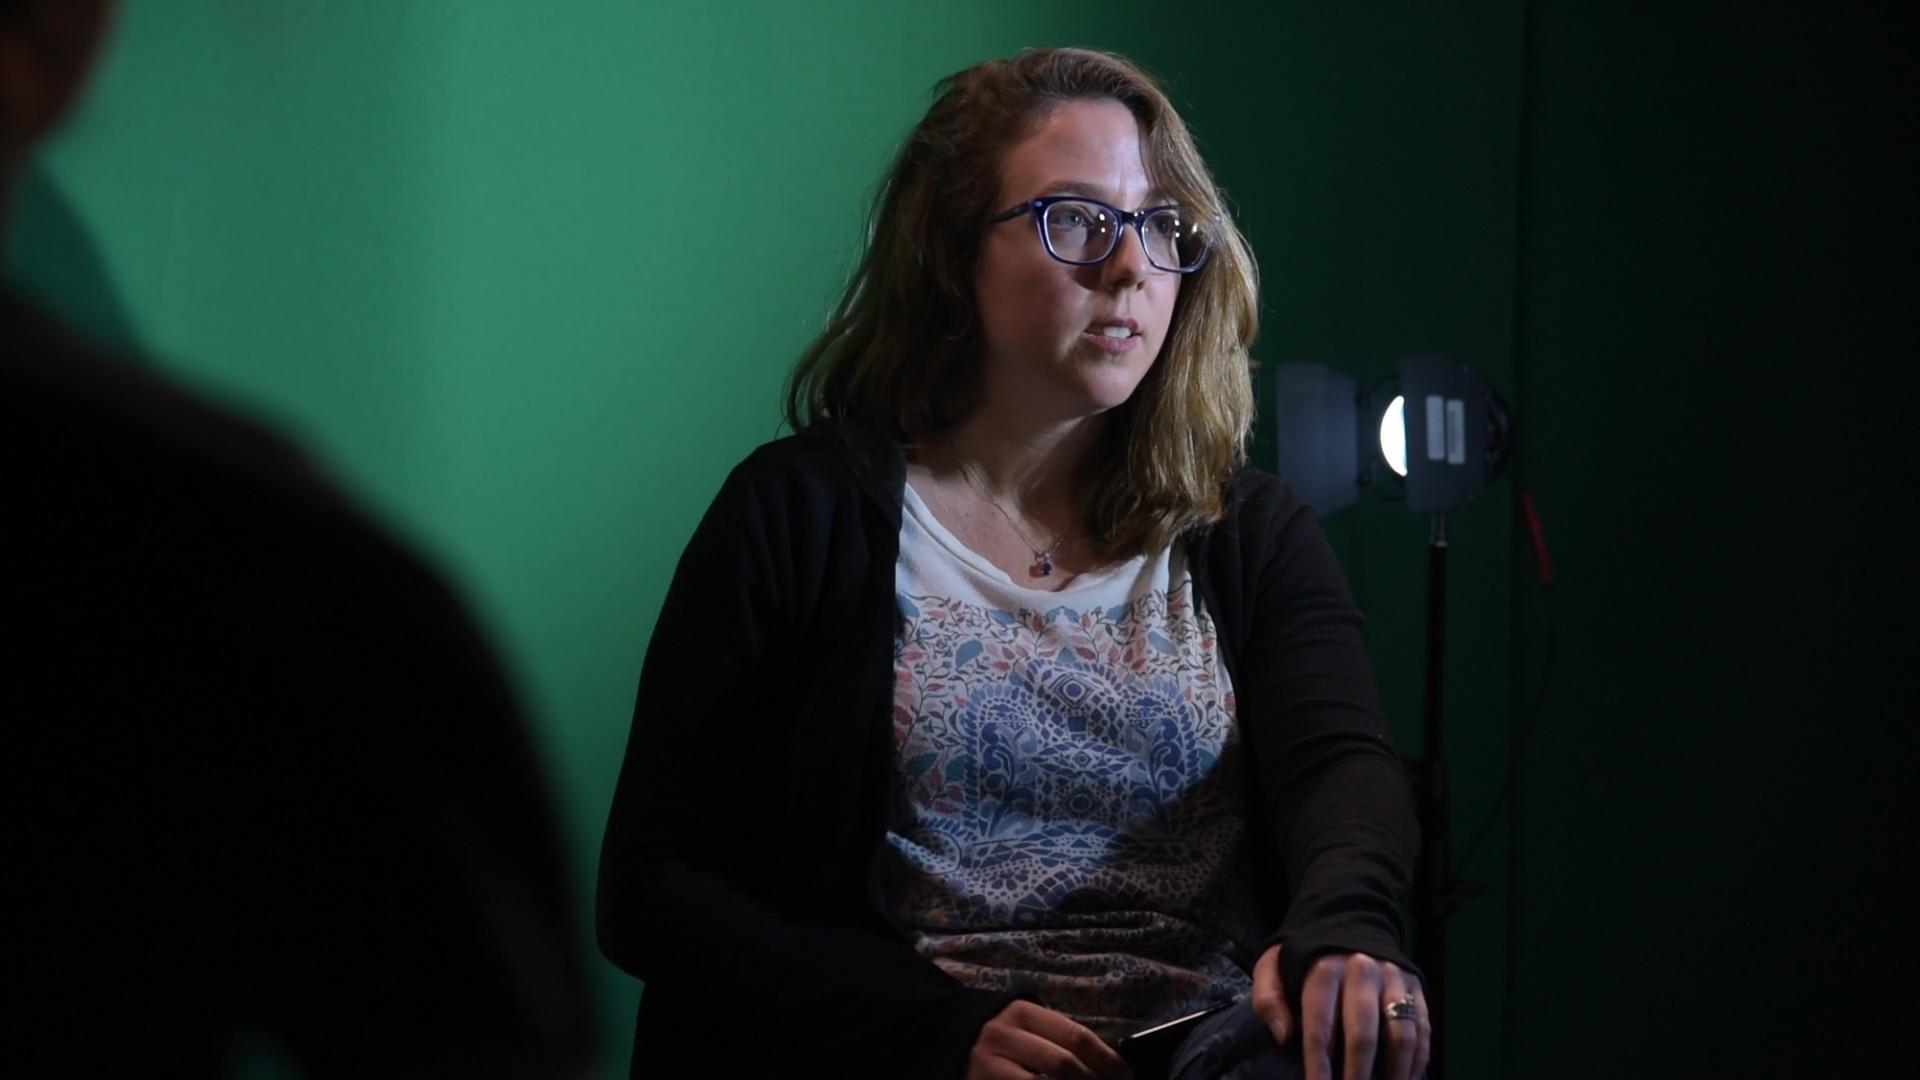 Melanie Green behind the scenes on the set of Geena Matuson's (@geenamatuson) film shoot, 2019. Cinematography by Matthew DeVirgilio. See more @ geenamatuson.com.